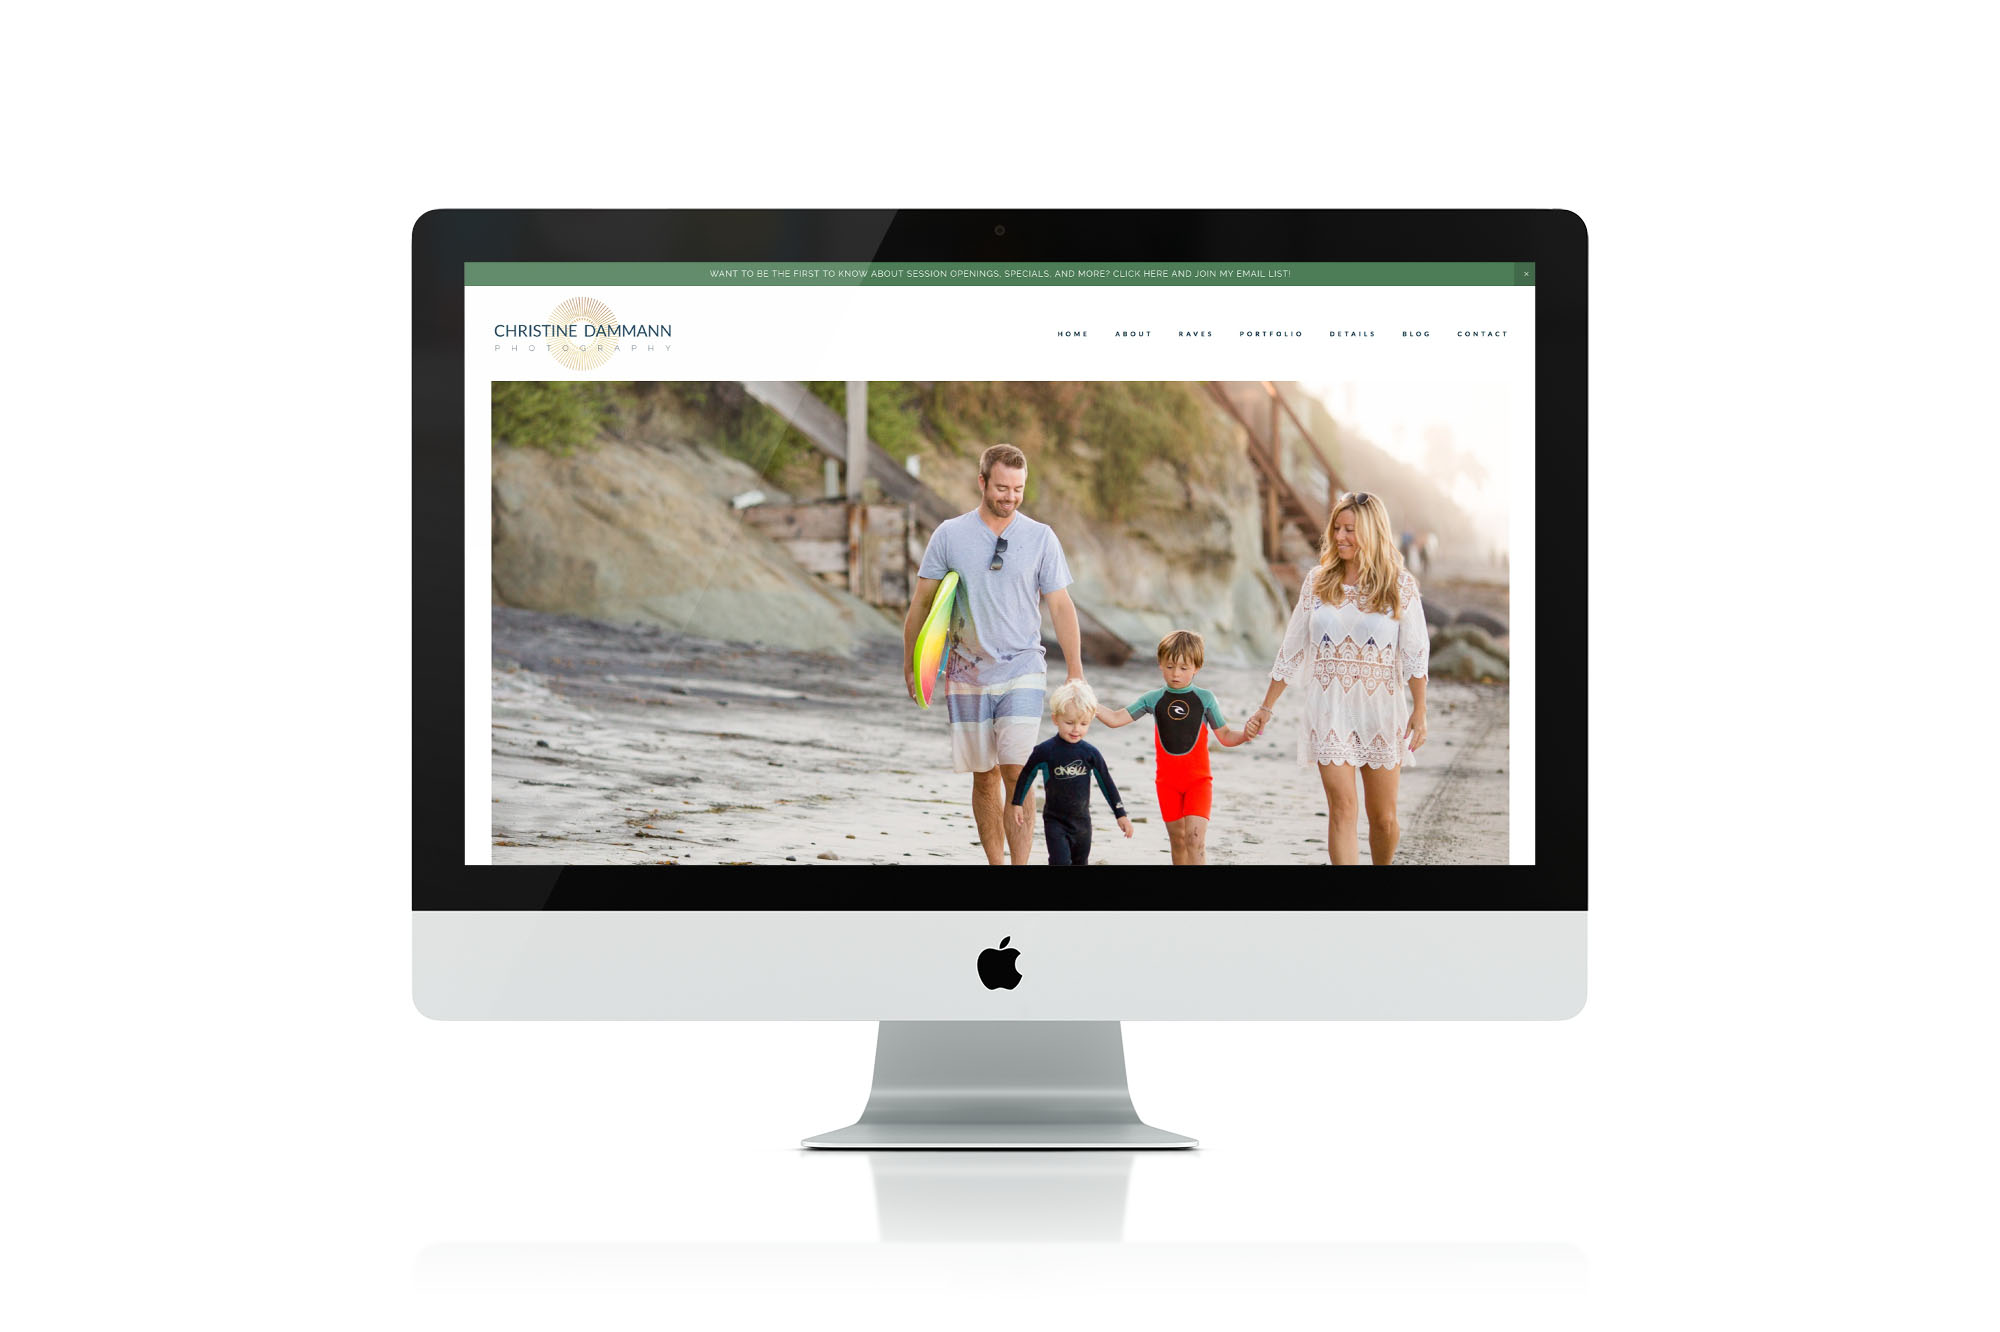 Christine-Dammann-Photography-fun-bright-modern-custom-squarespace-website-for-photographers-inspiration-h.jpg